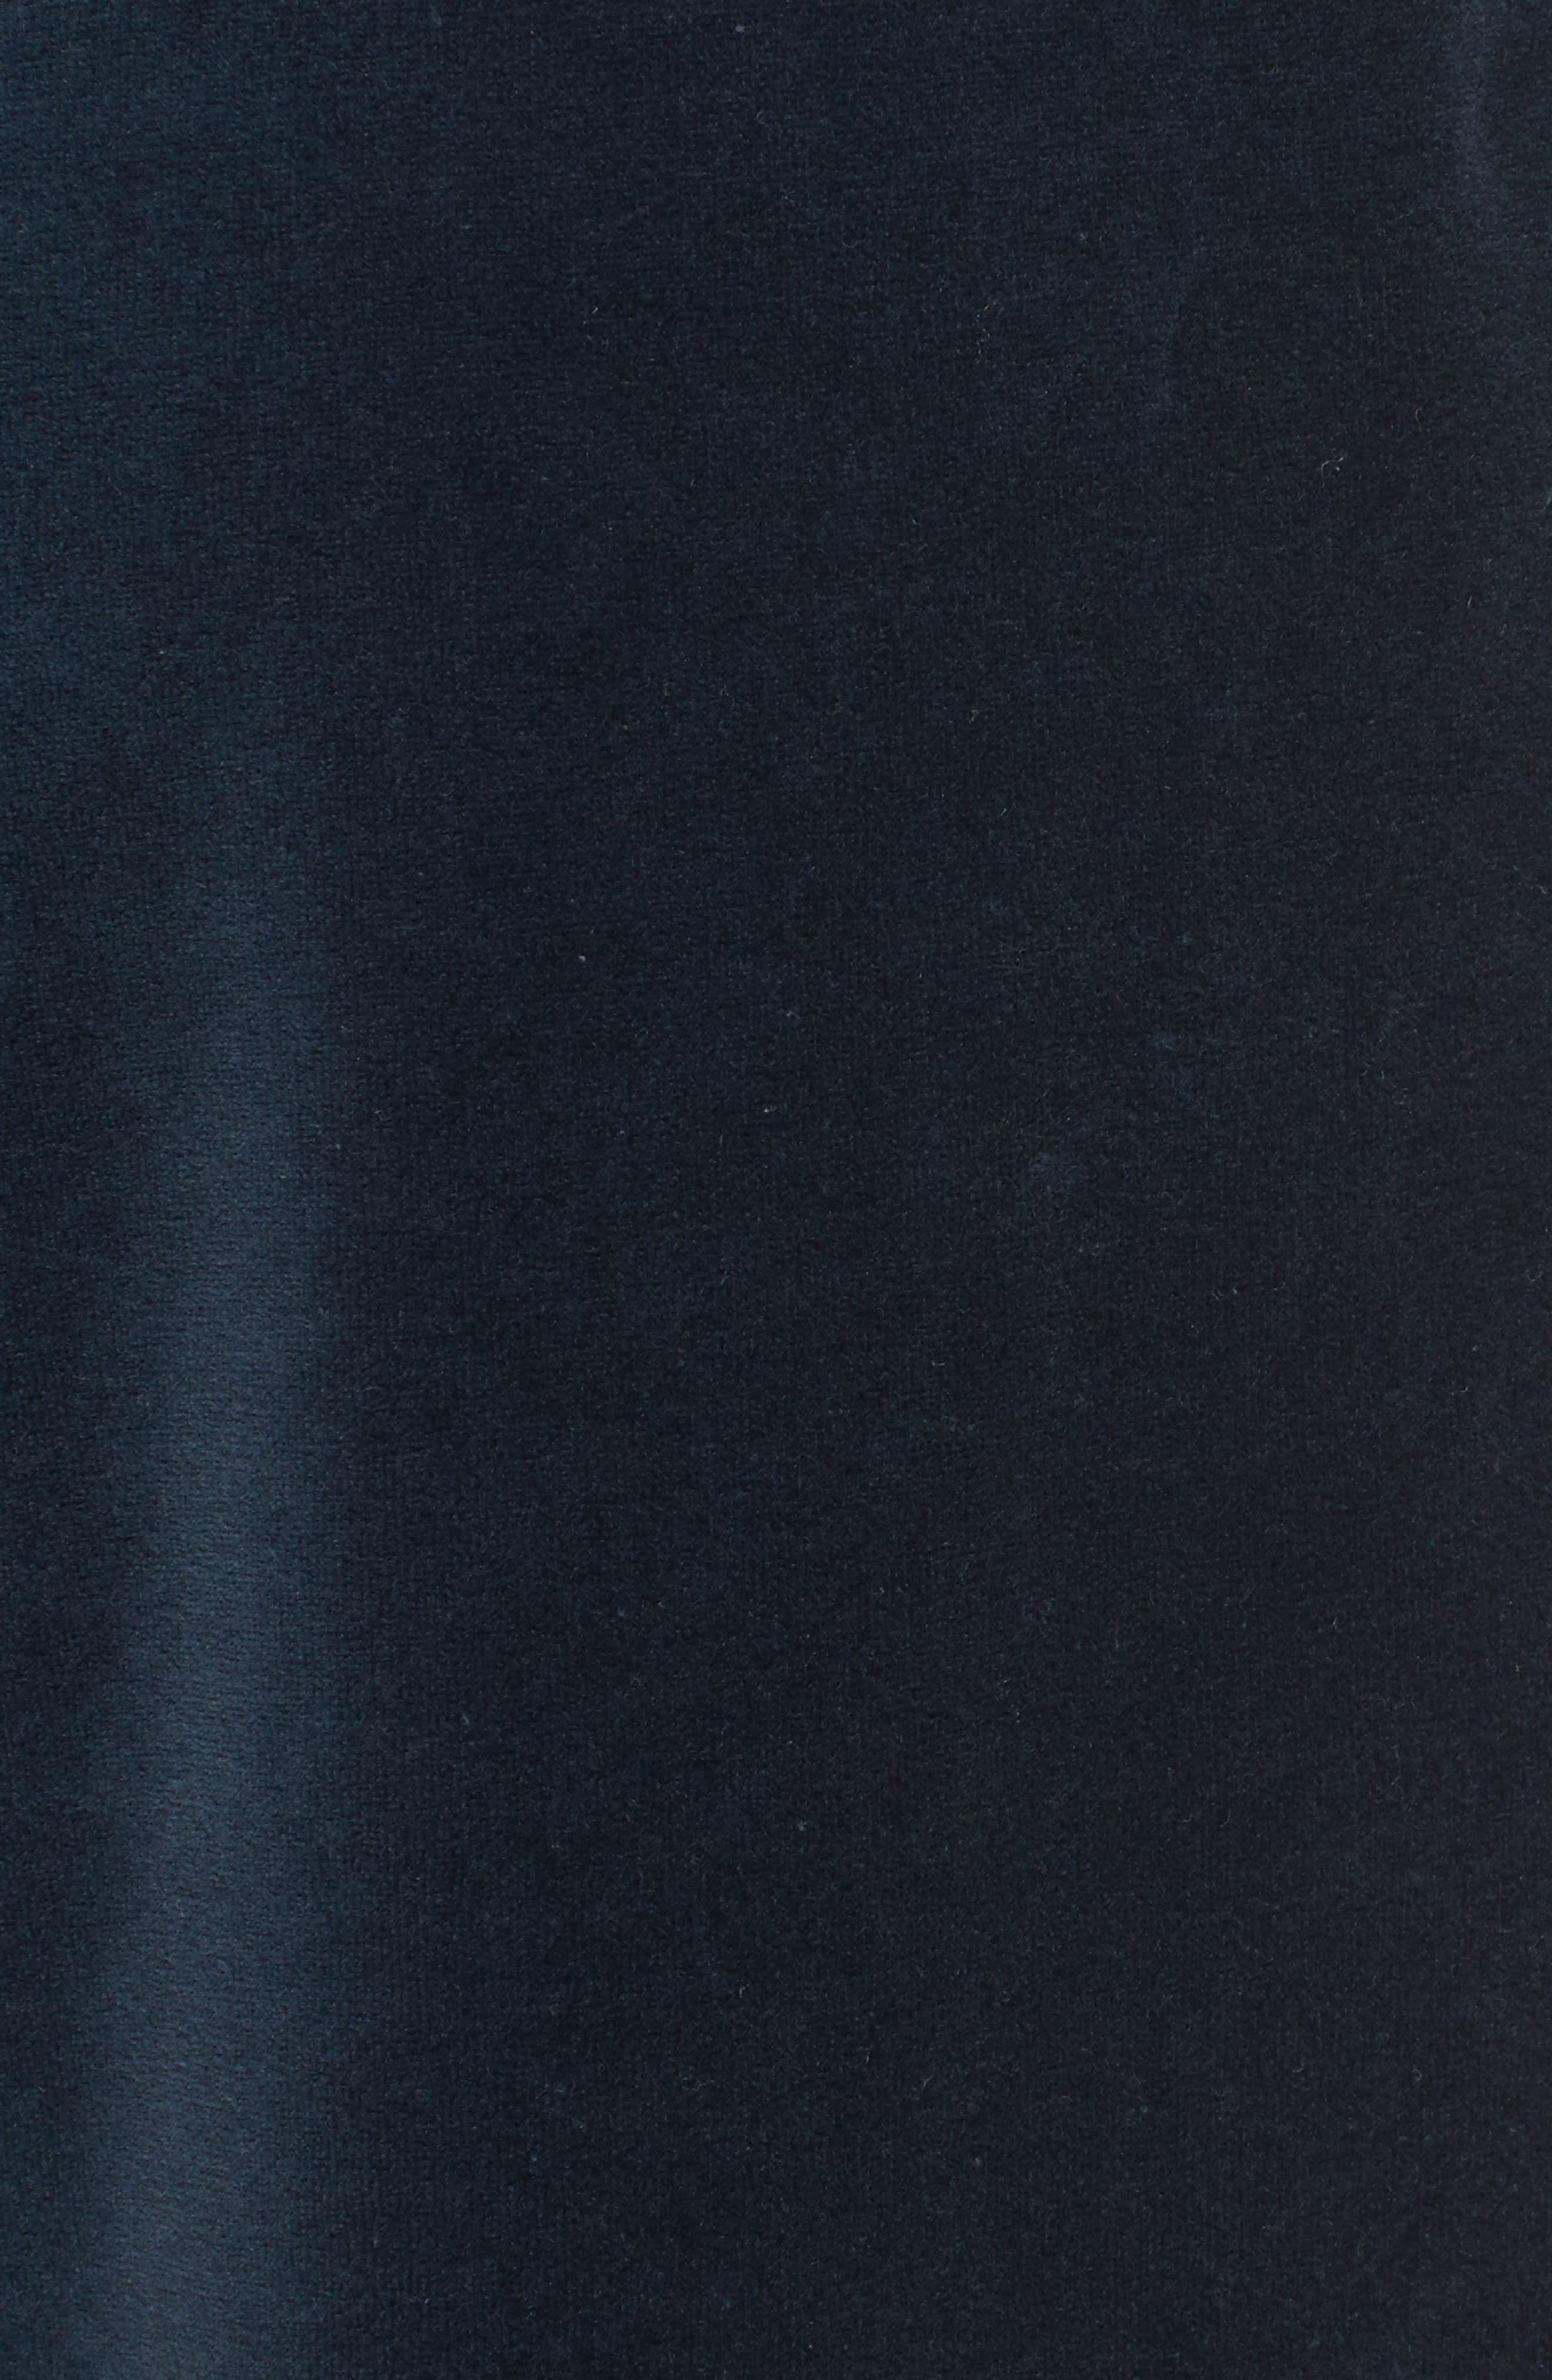 Double Layer Shorts,                             Alternate thumbnail 5, color,                             410